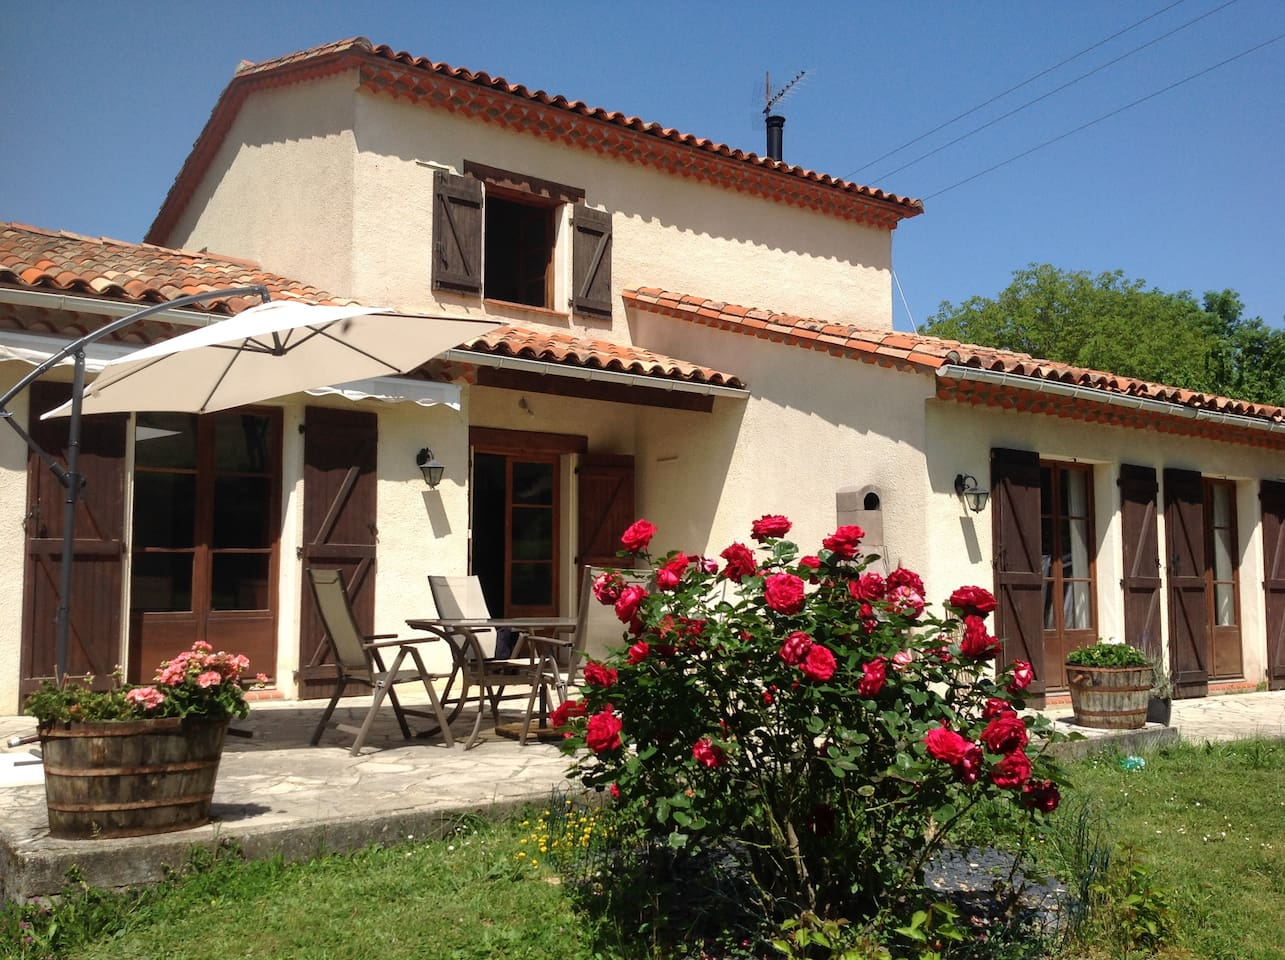 Chez Irene - the sunny south facing patio